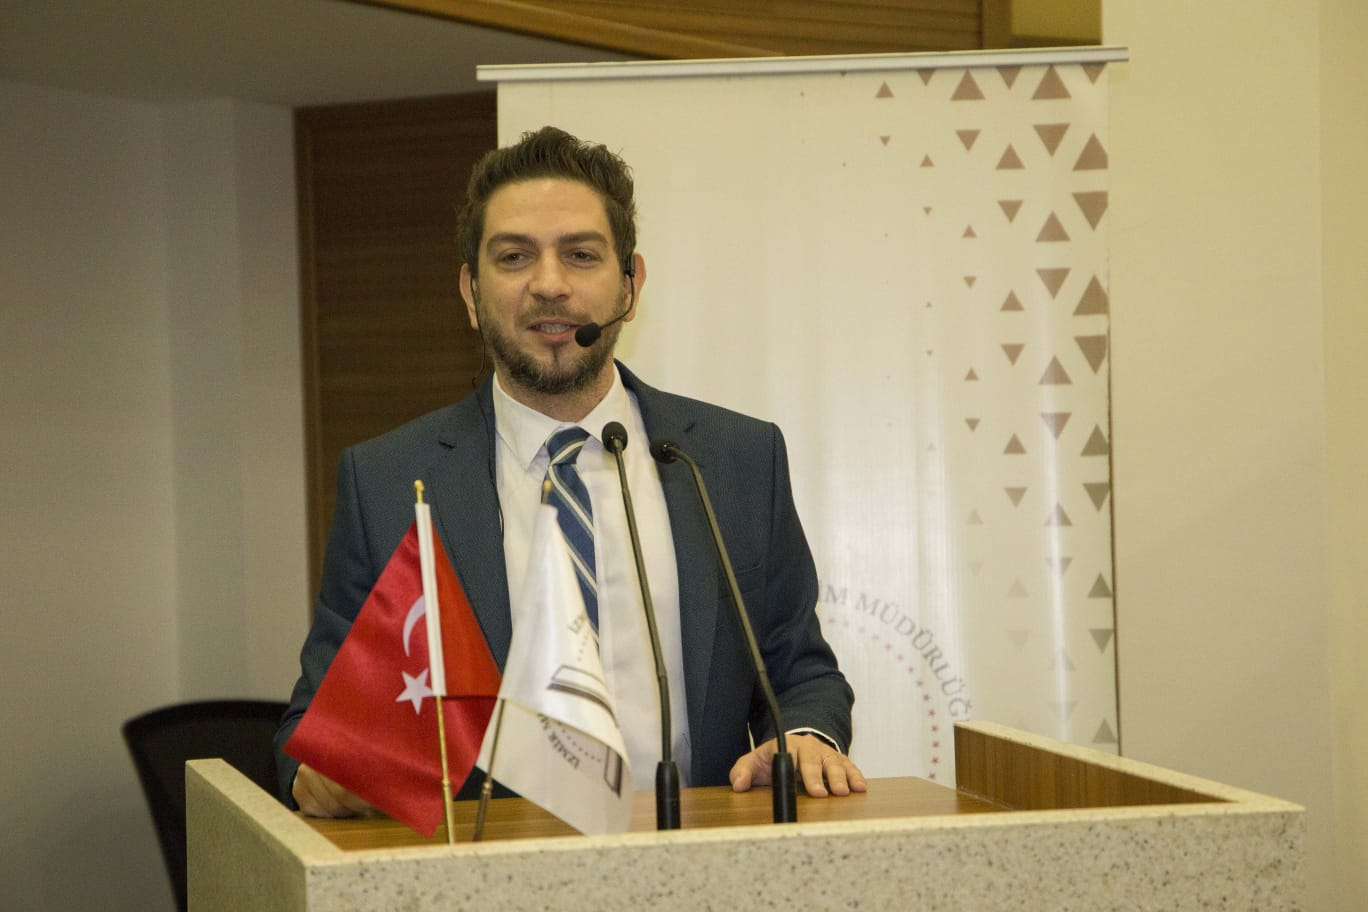 Alp Köksal İzmir İl Milli Eğitim